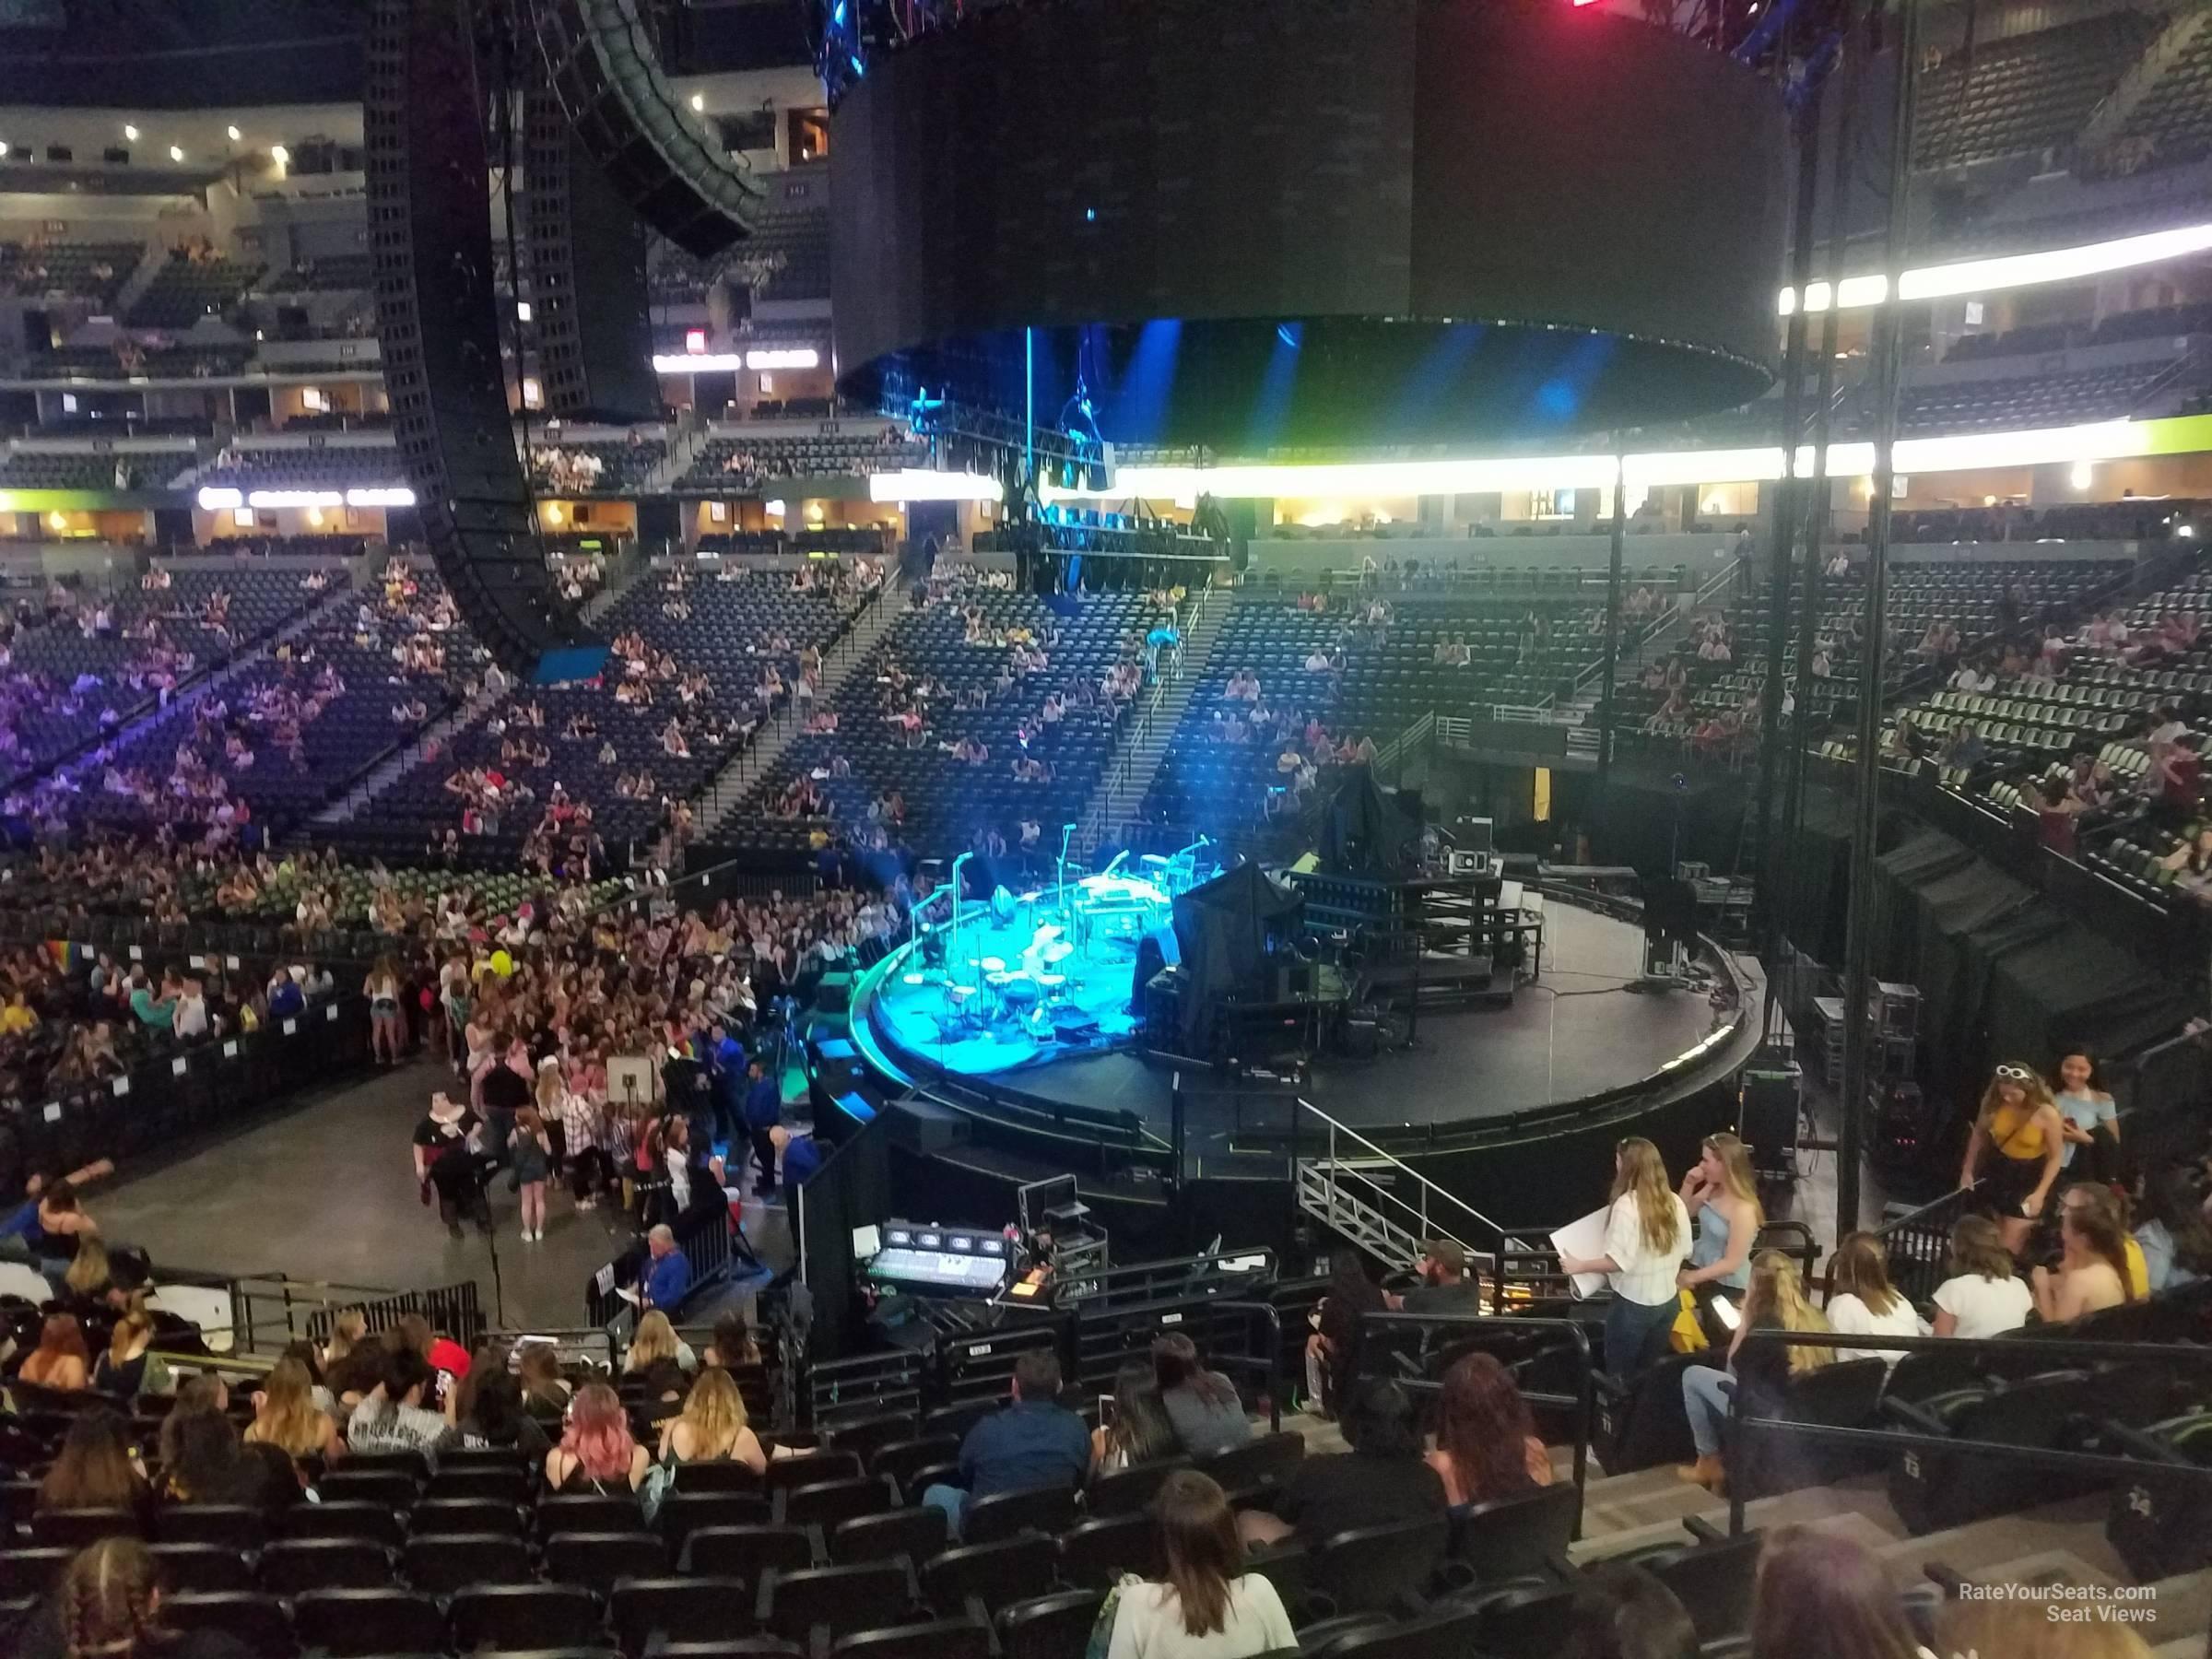 Pepsi Center Section 144 Concert Seating Rateyourseatscom